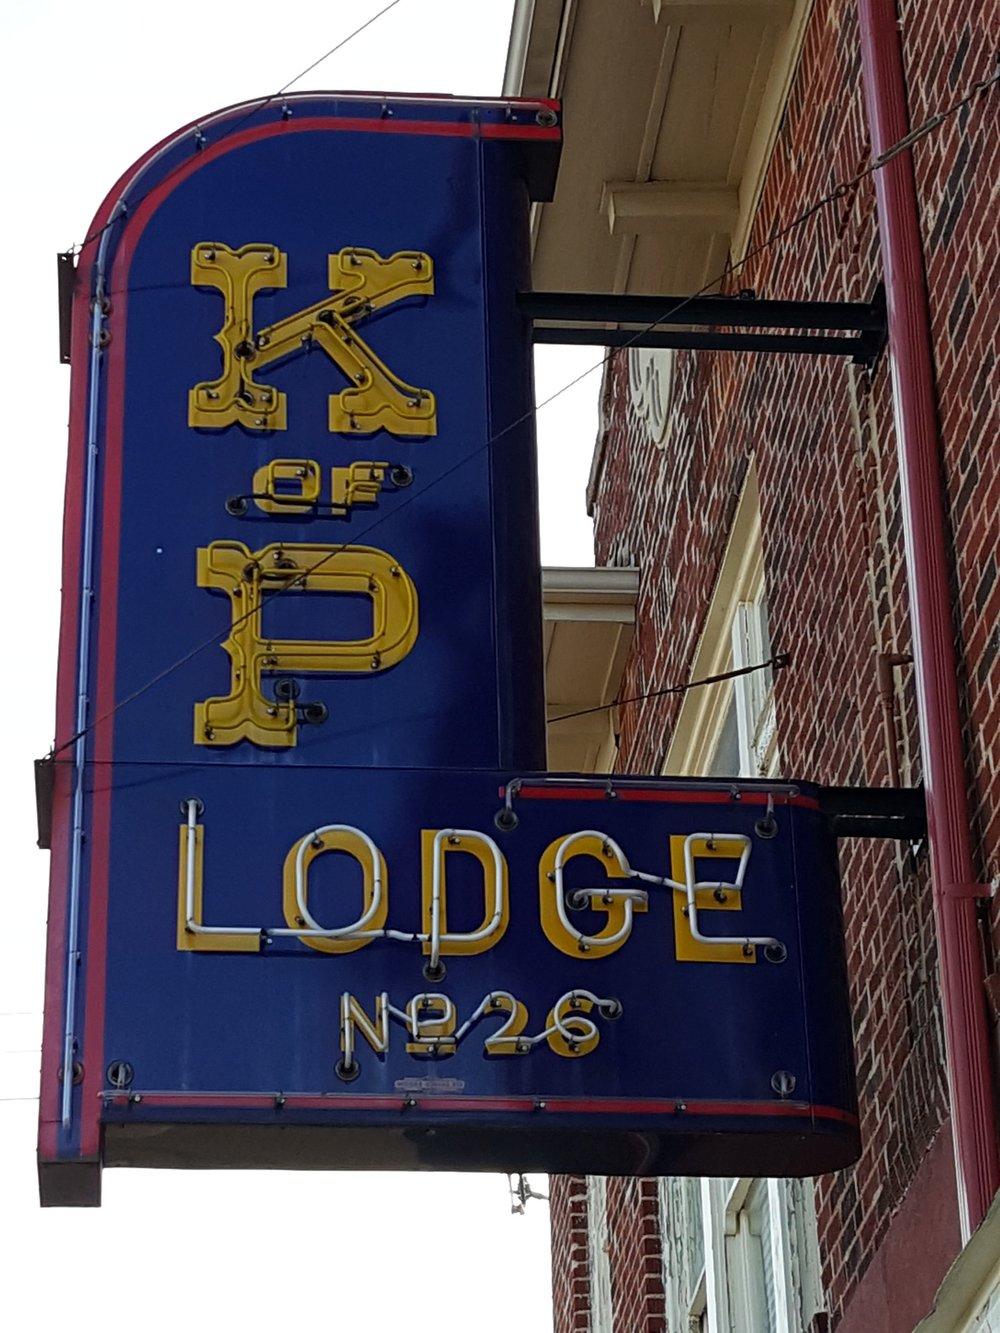 - Chancellor Commander:Secretary: Bryan Williams  118 S. Ward Drive  Longview, Texas 75604 gskoptx@gmail.com 903-736-7690 Lodge Deputy:Sonny Adkisson